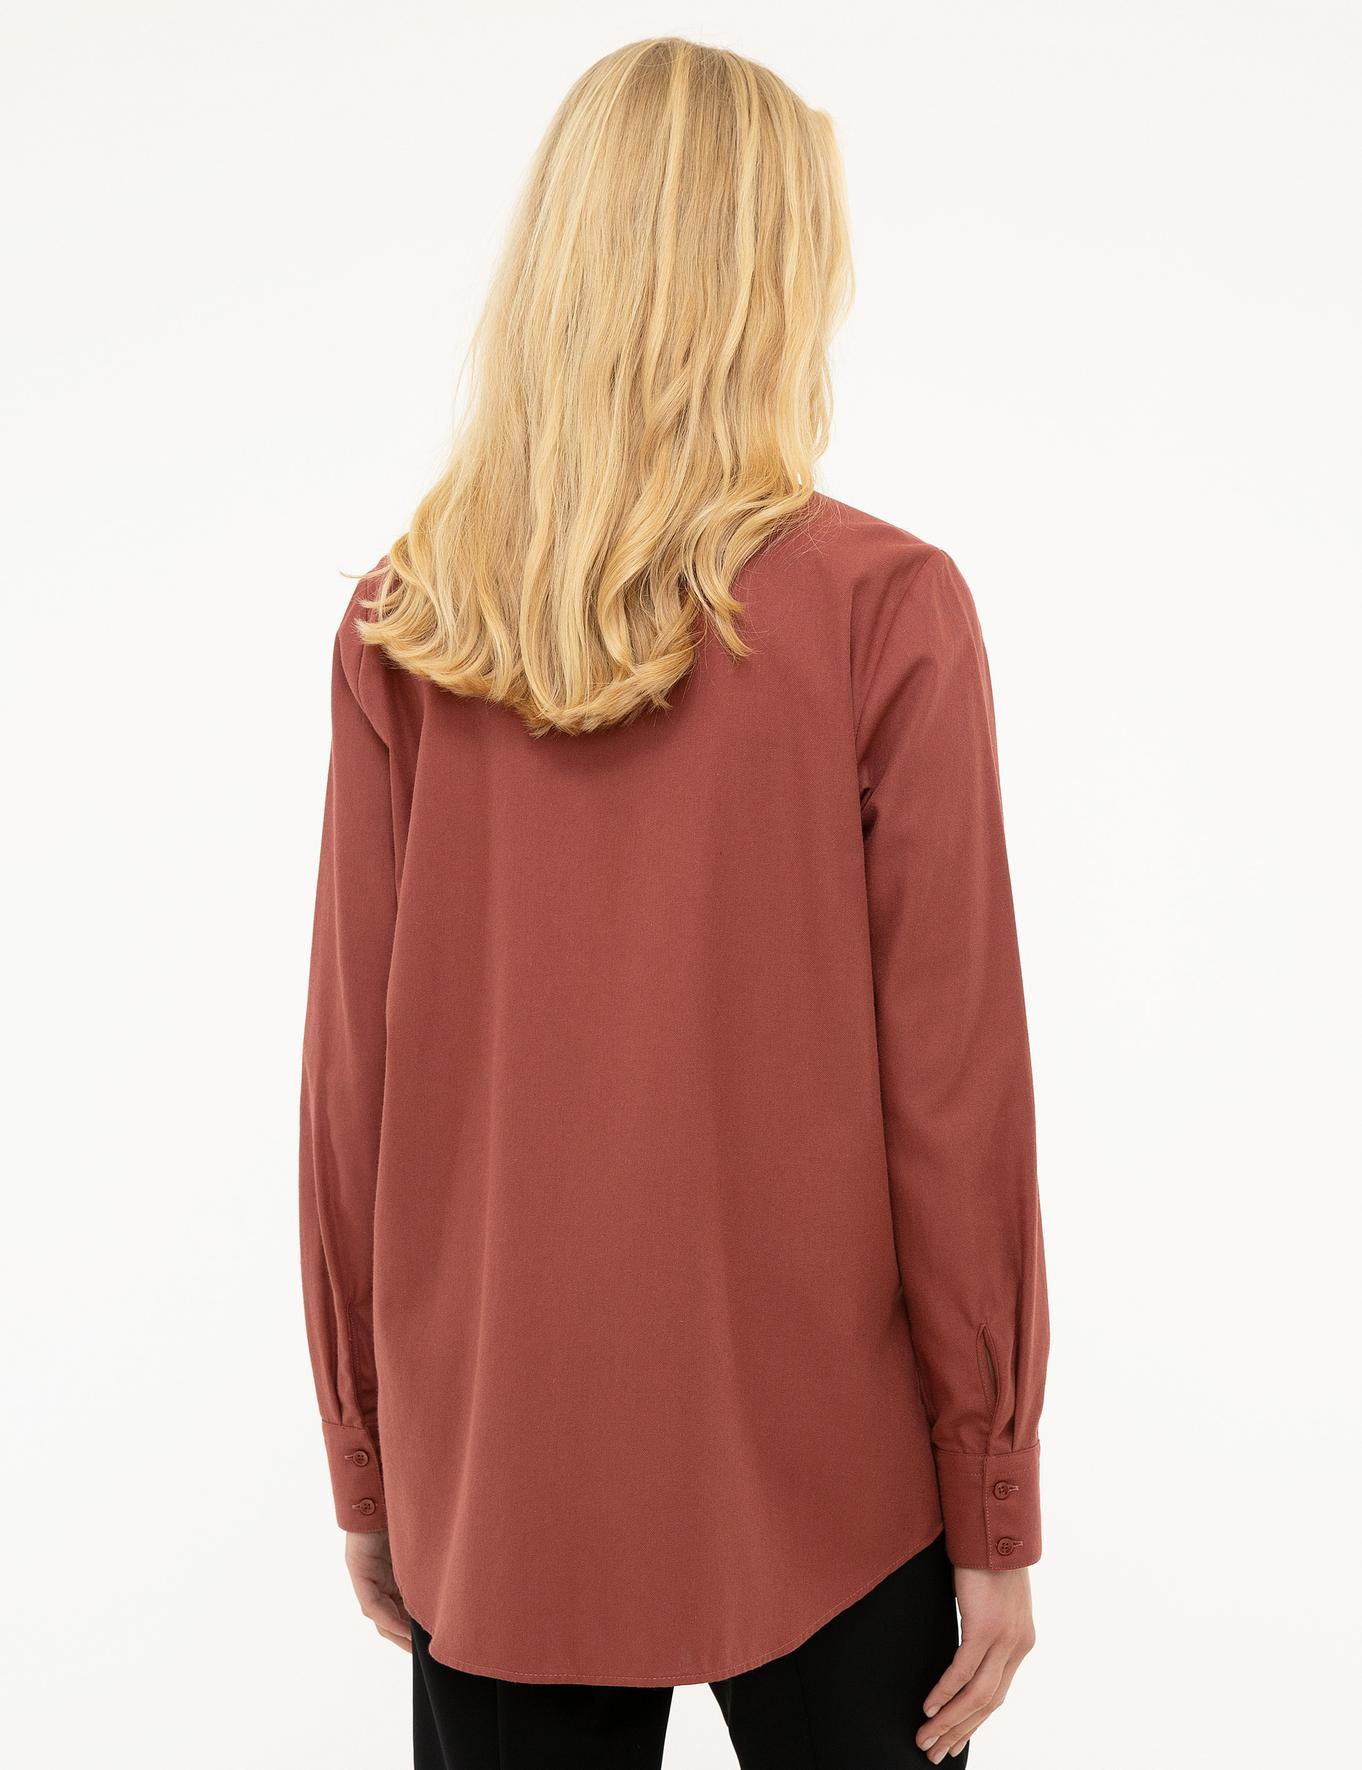 Kırmızı Dokuma Gömlek